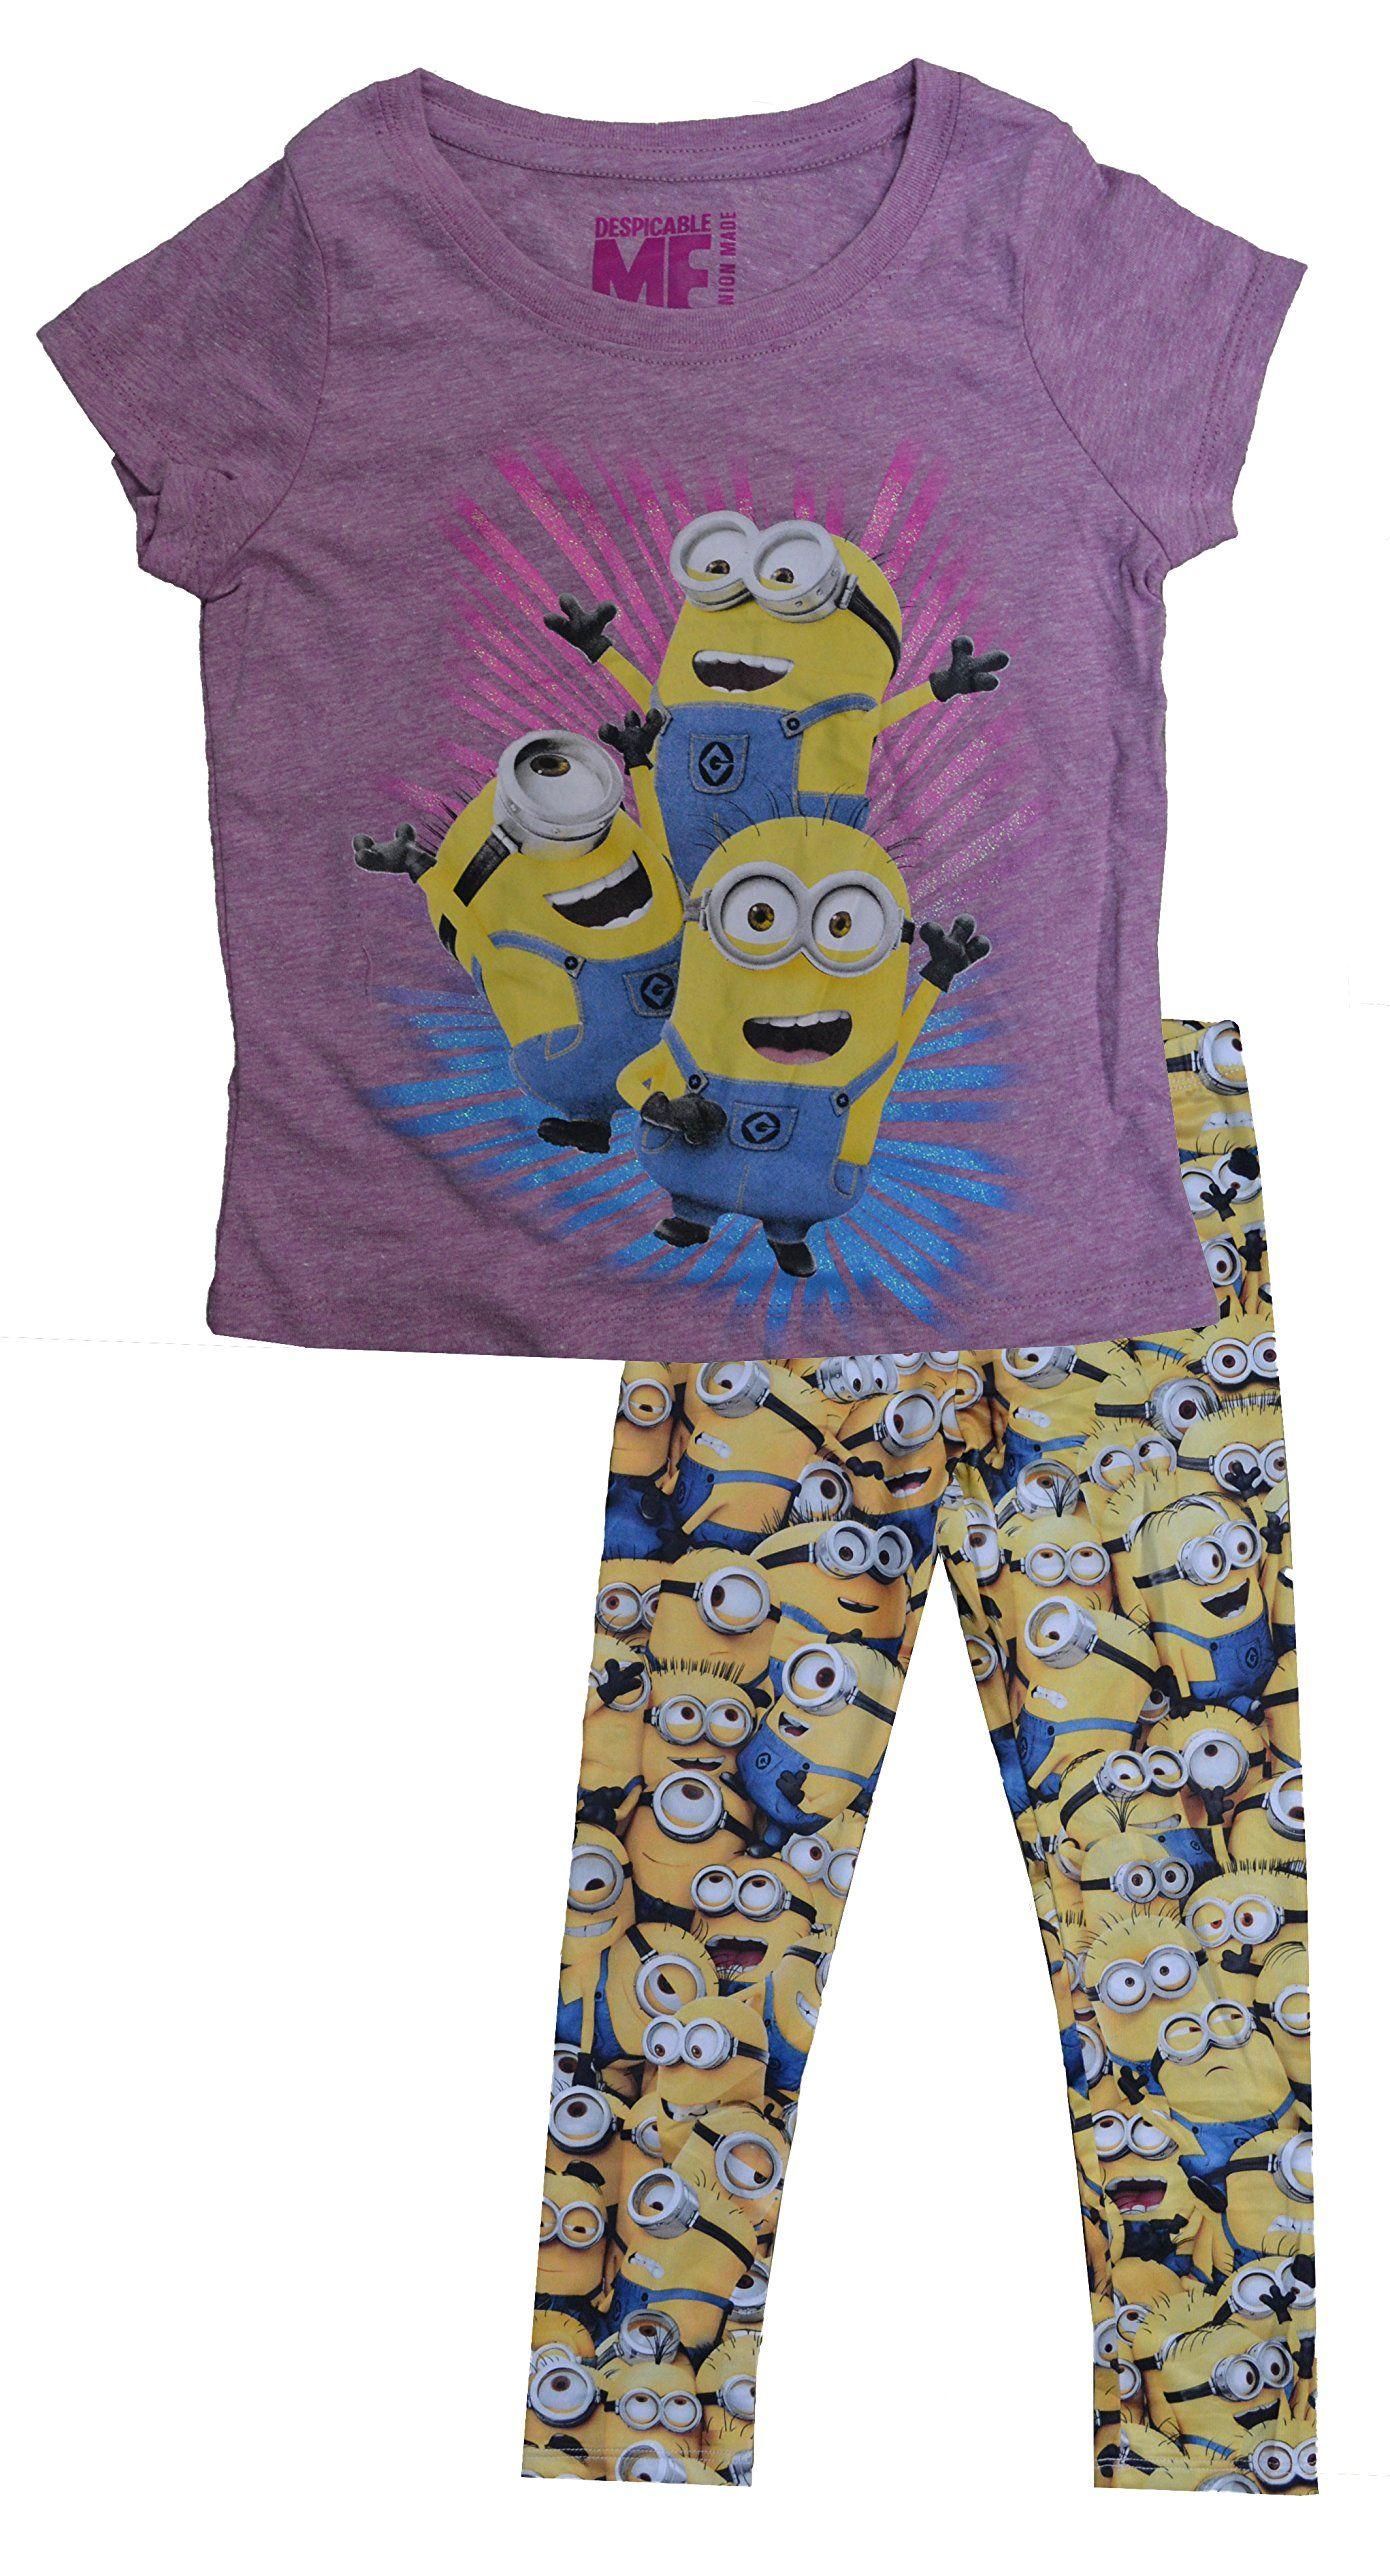 Despicable Me Toddler Boys Costume Puffer Vest /& Top Set Size 2T 3T 4T